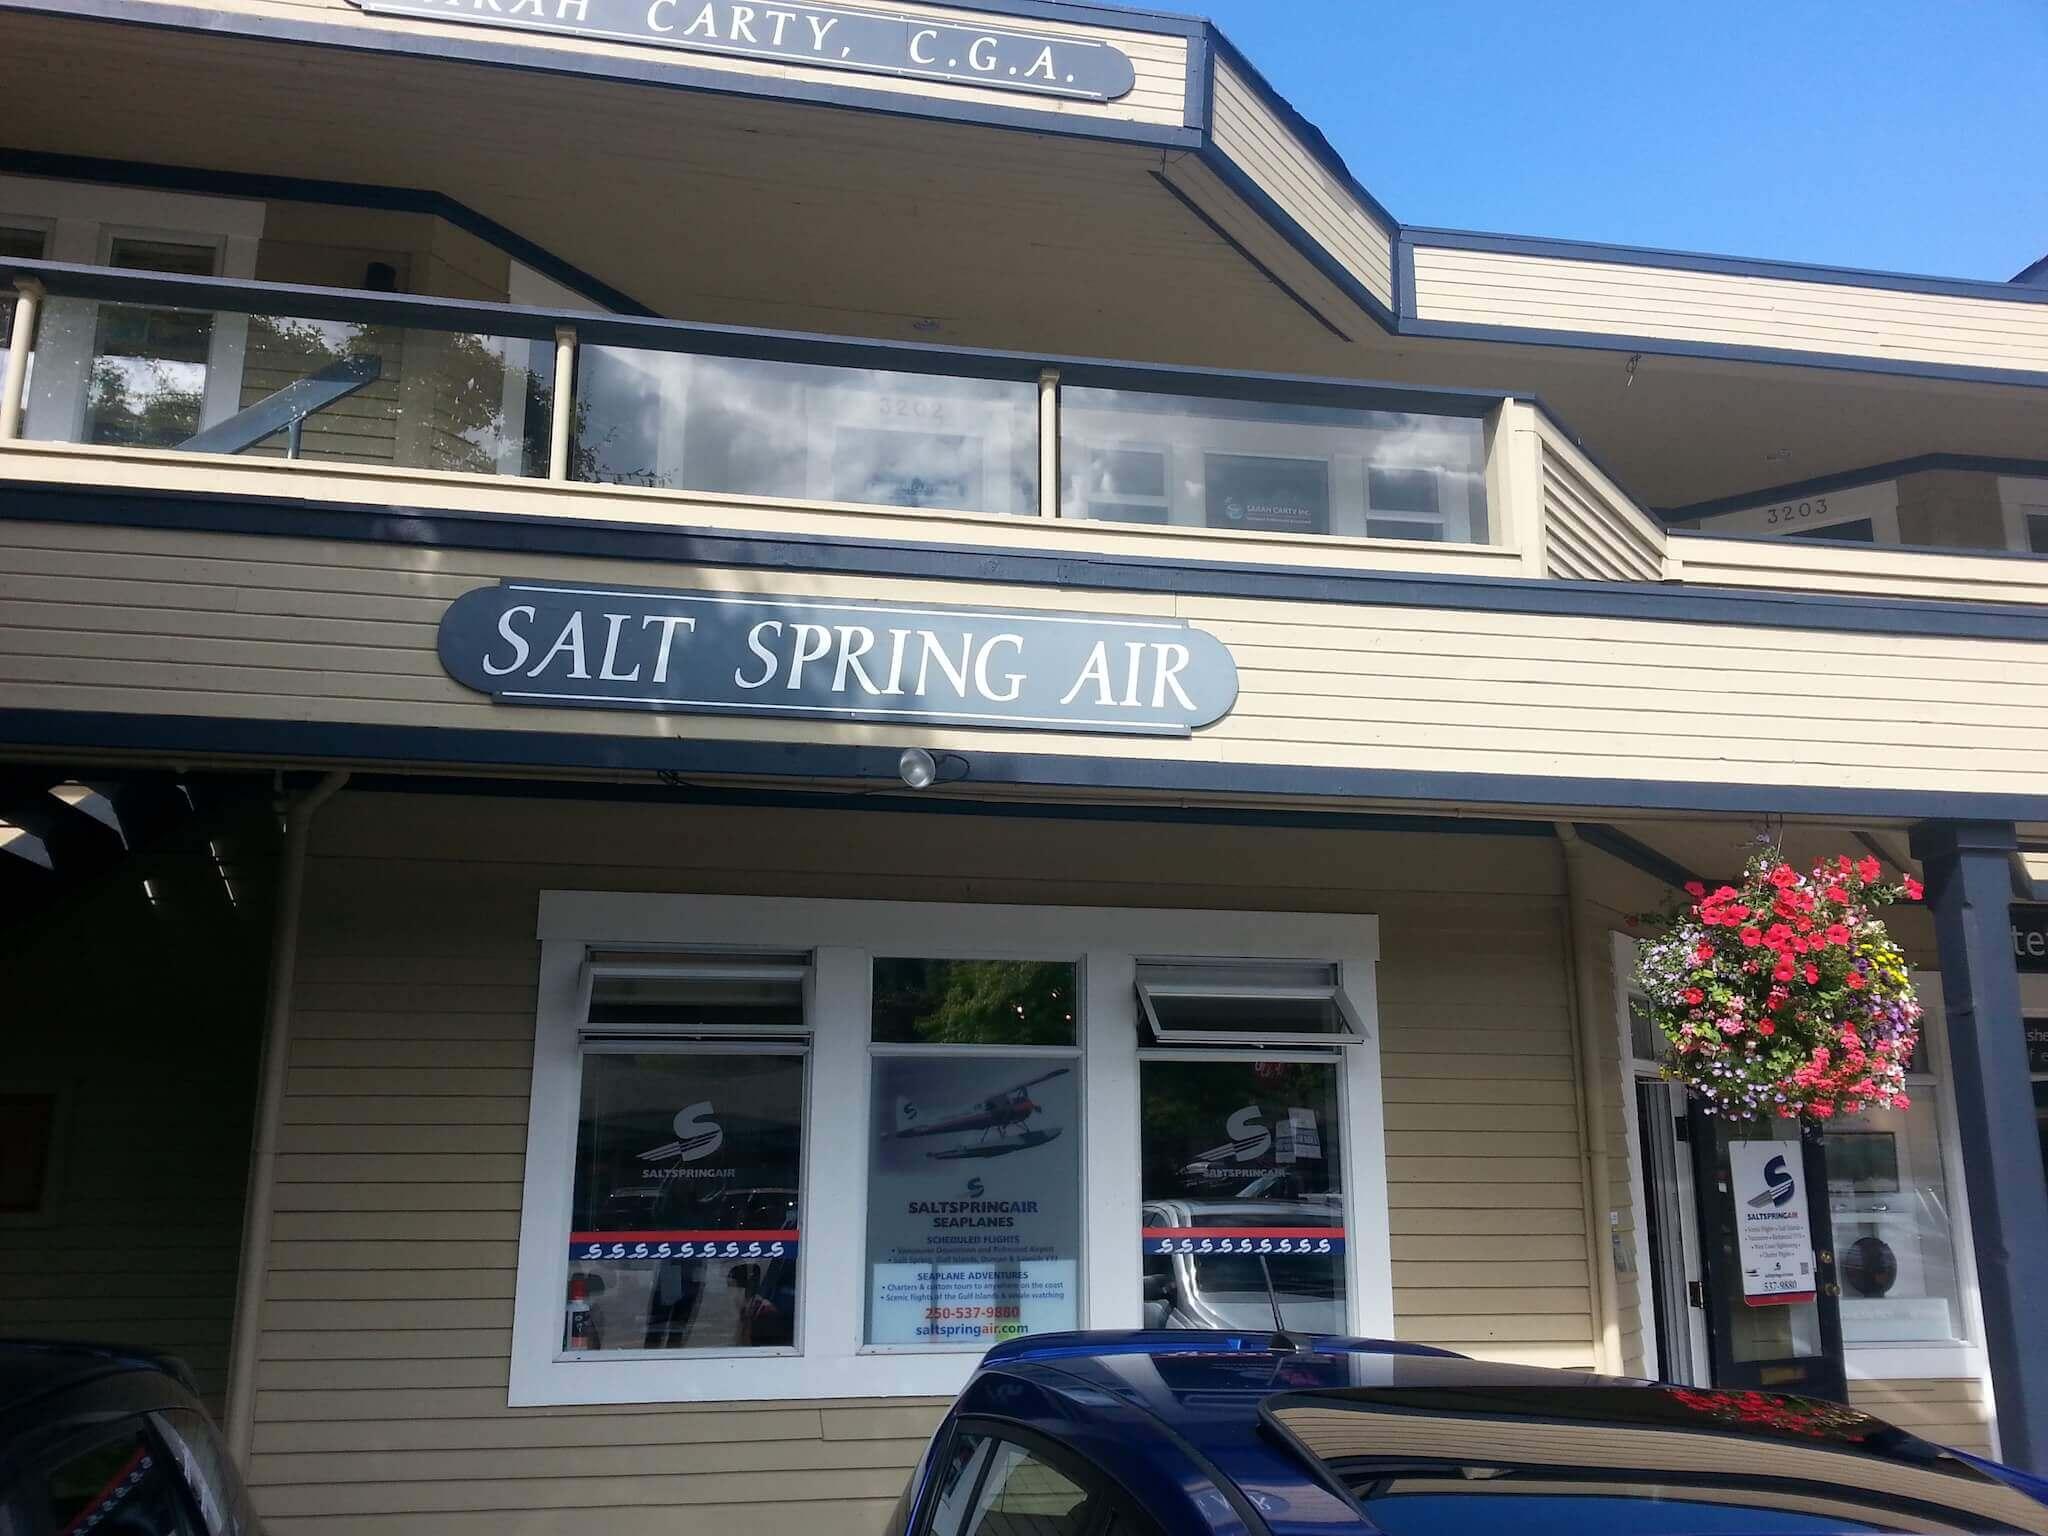 Salt Spring - Salt Spring Air Business Profile - 04